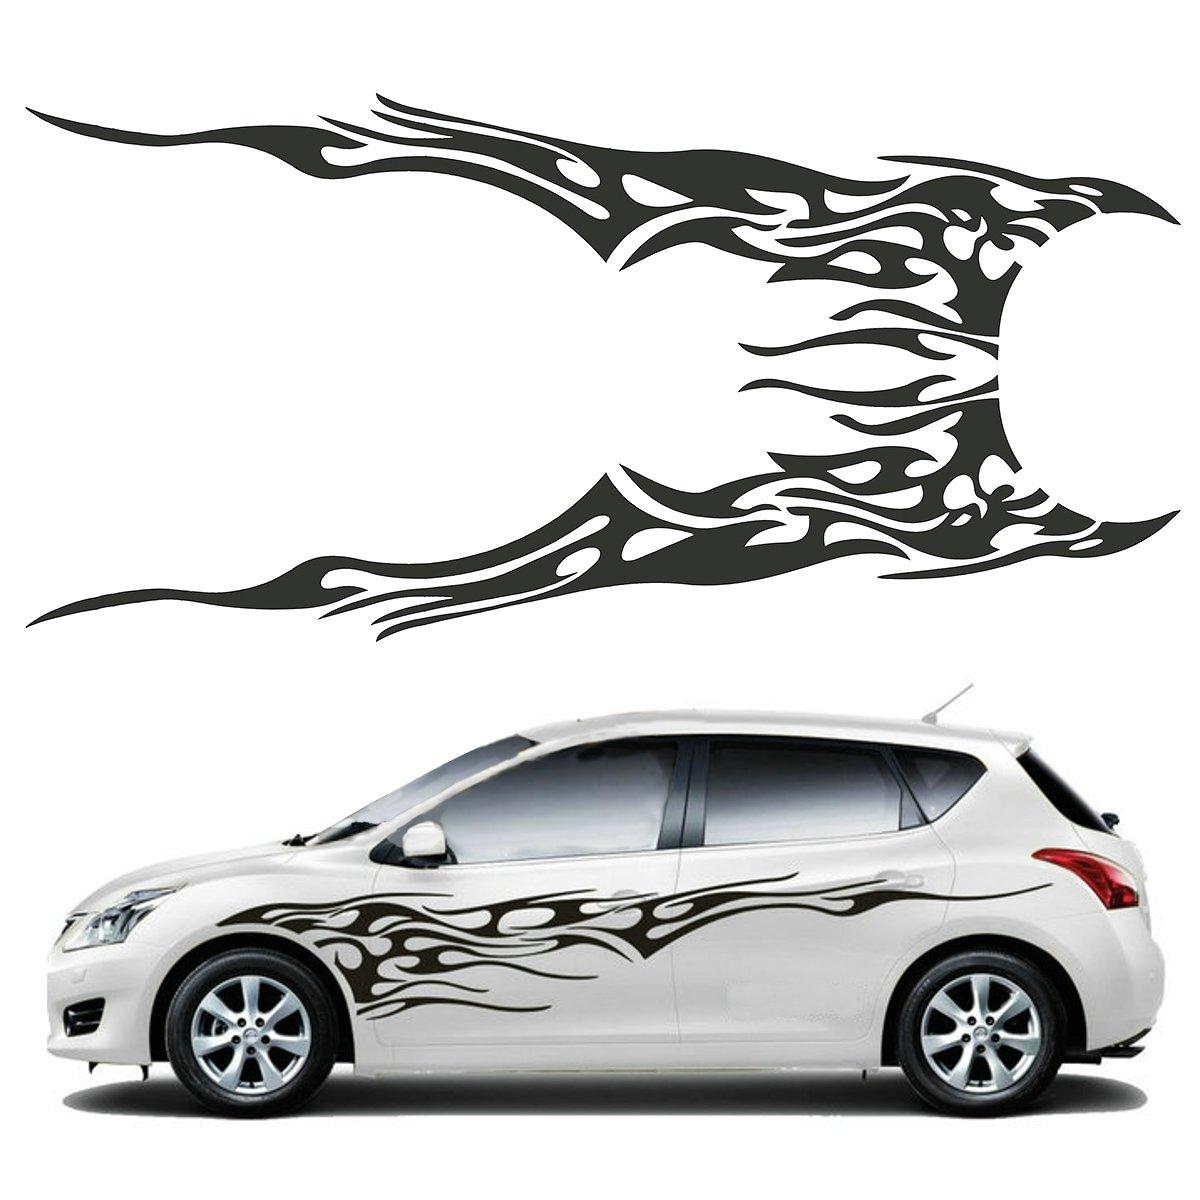 Bumper sticker creator canada - Pair 210 5 X 48cm Black Universal Car Flame Graphics Vinyl Car Side Sticker Decal Waterproof